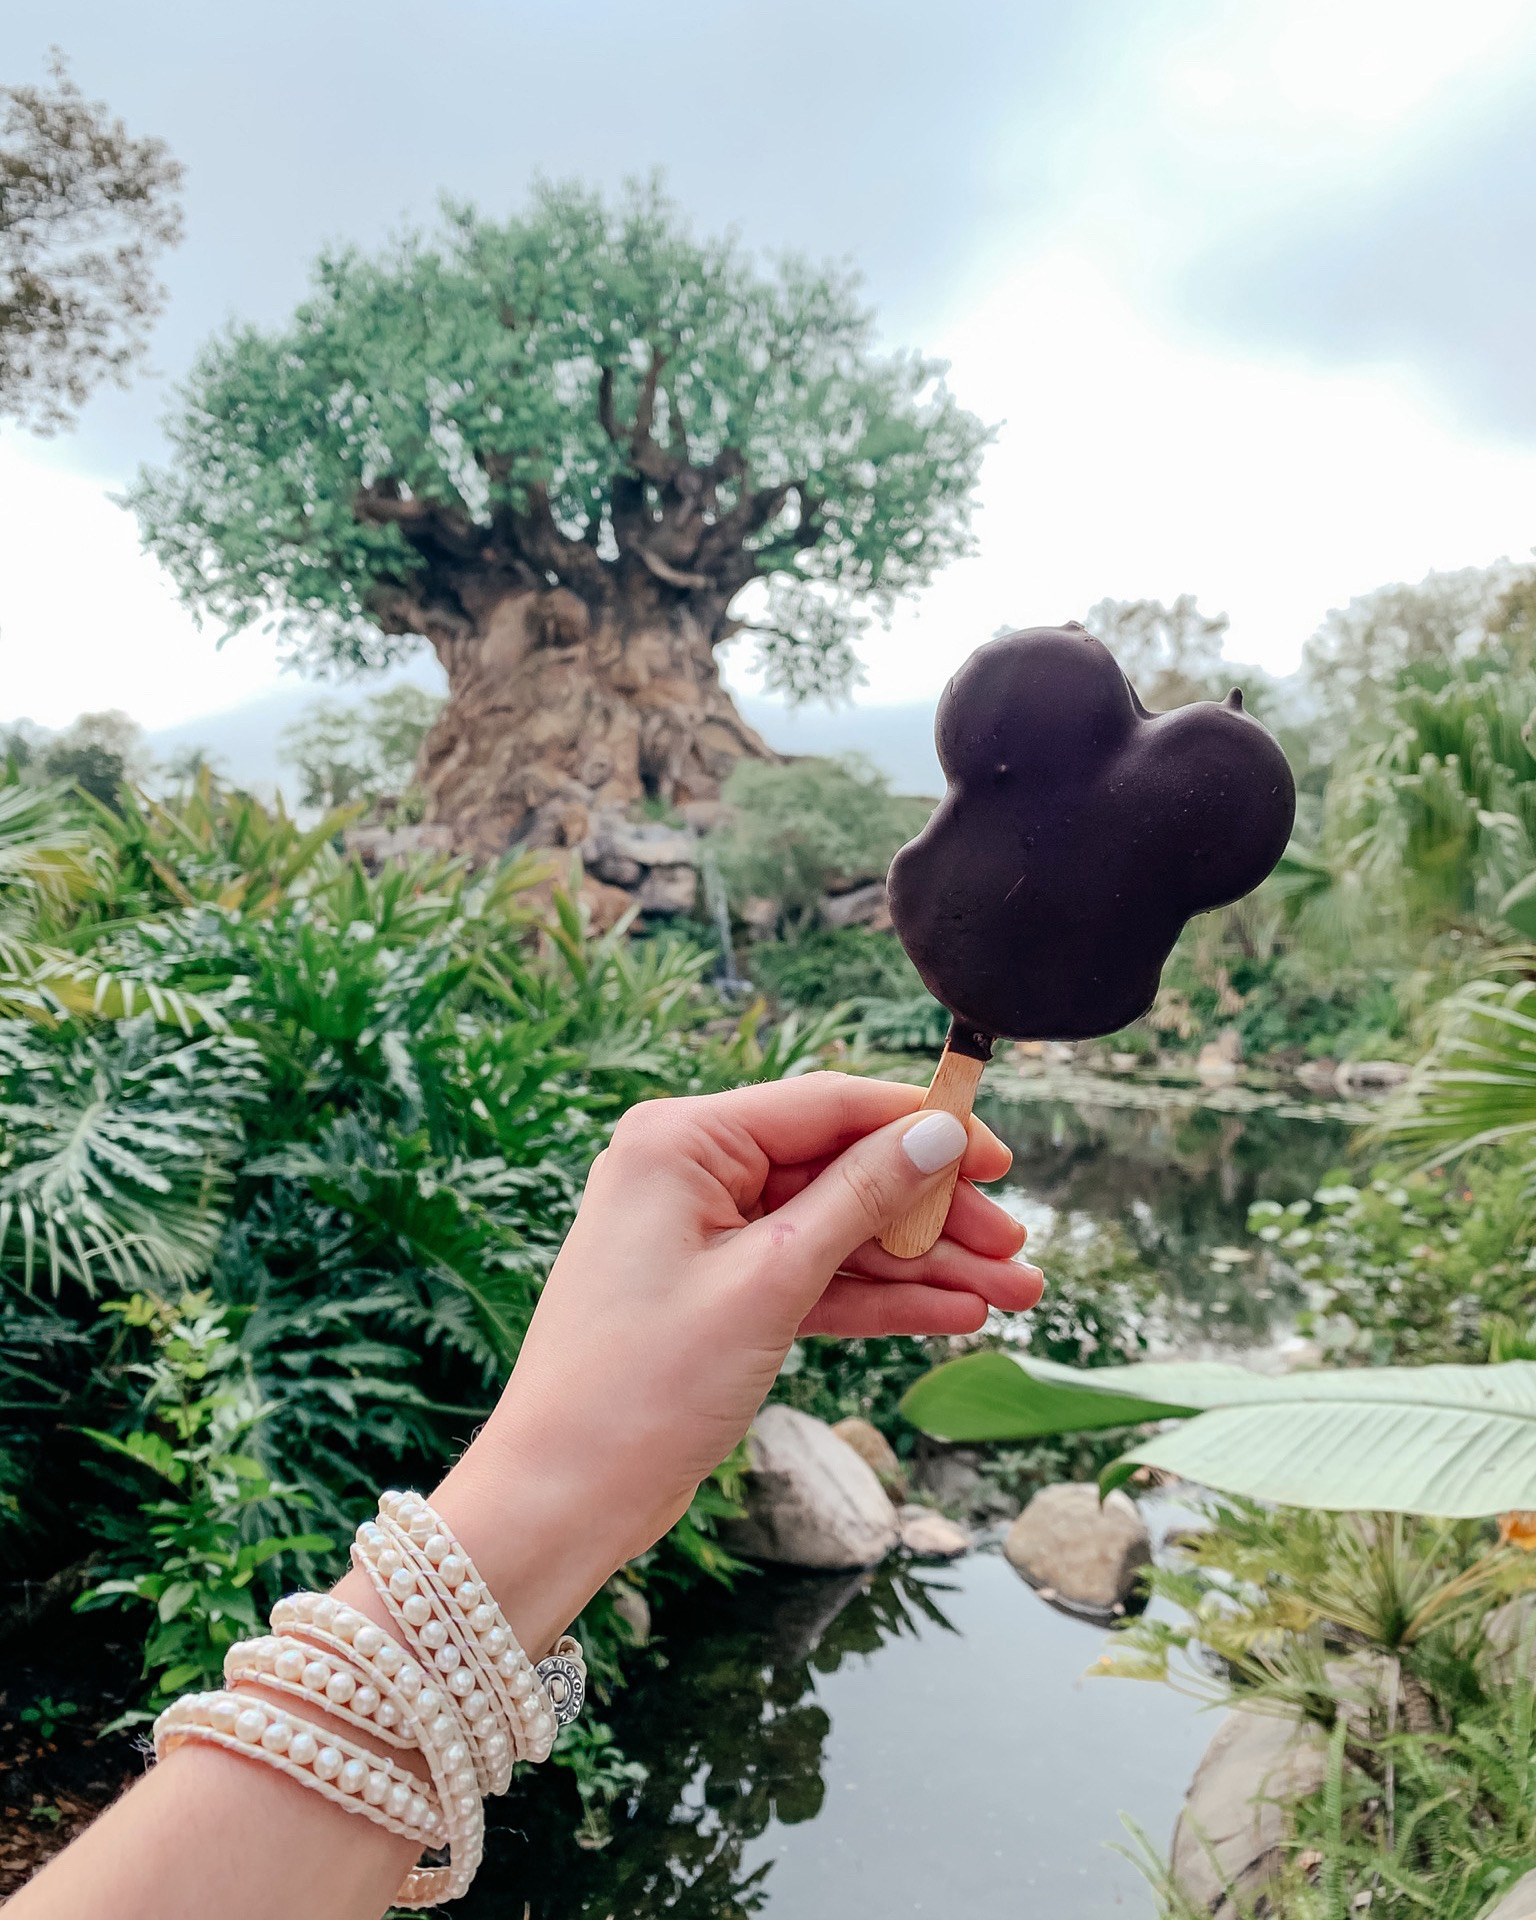 A Full Recap of #DisneyCreatorDays - 7 Days at Disney World and on a Disney Cruise! - Animal Kingdom